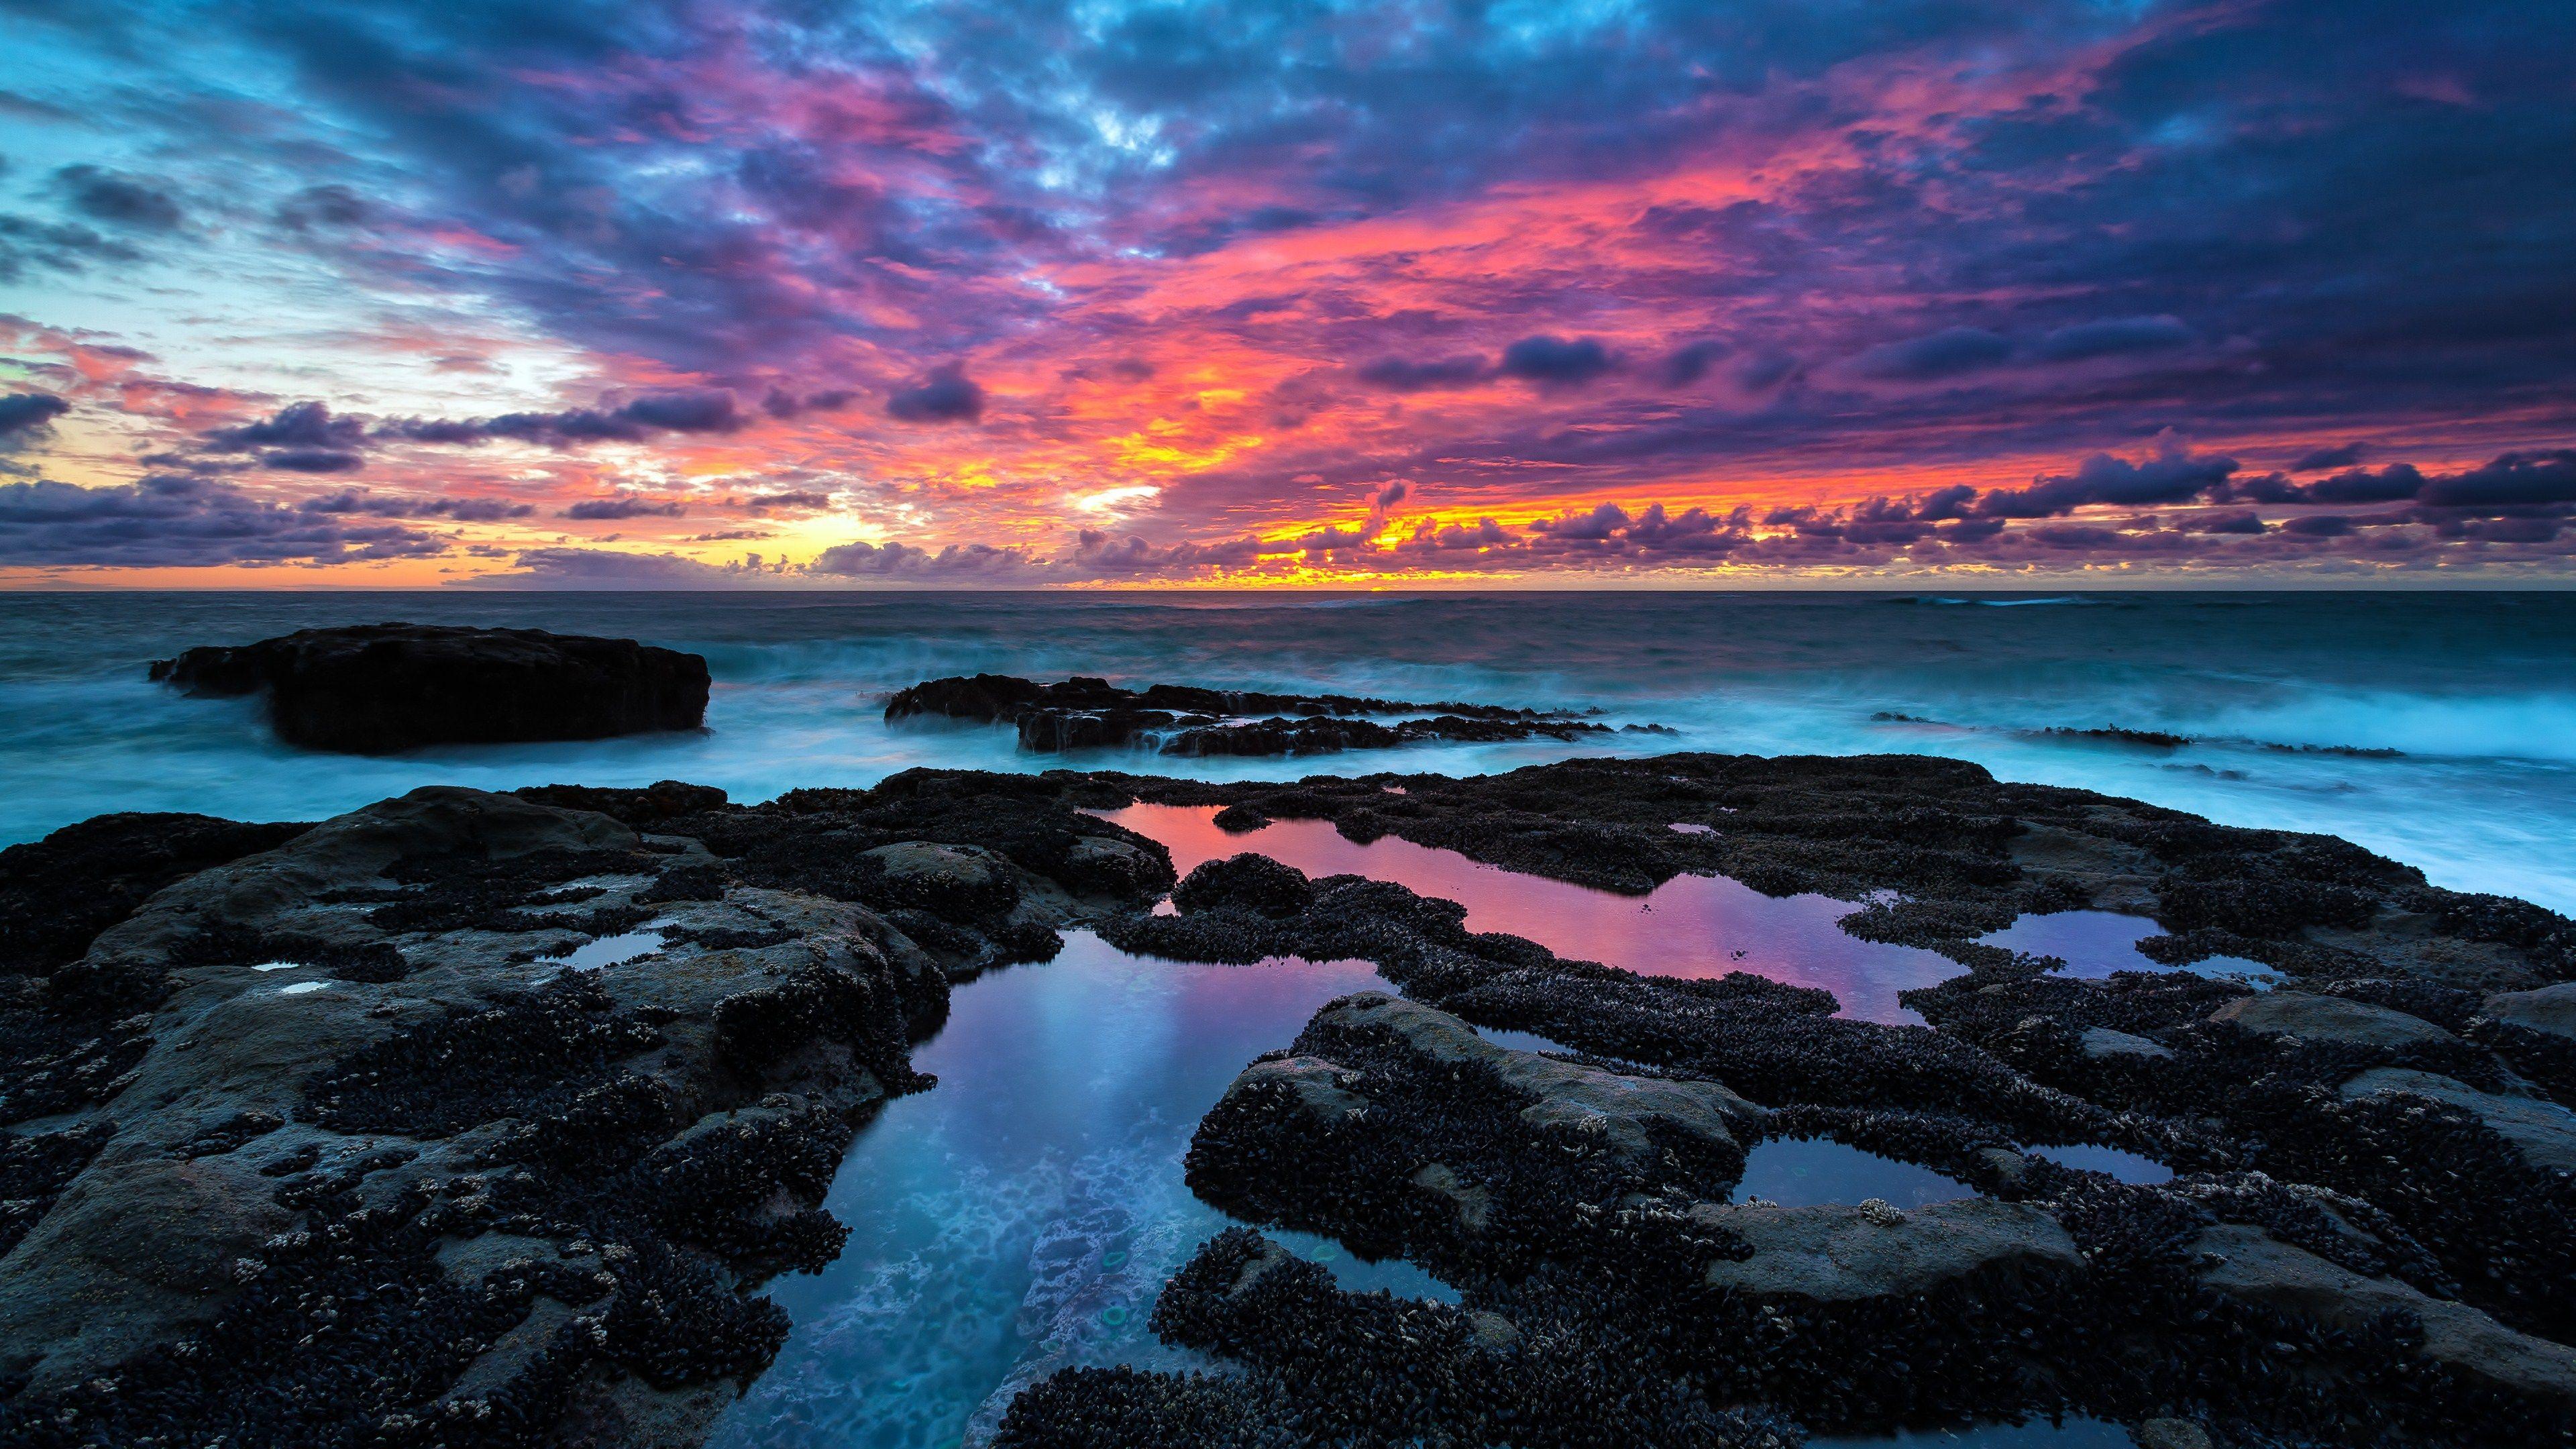 Earth Sunset Ocean Landscape Rock Nature 4k Ultrahd